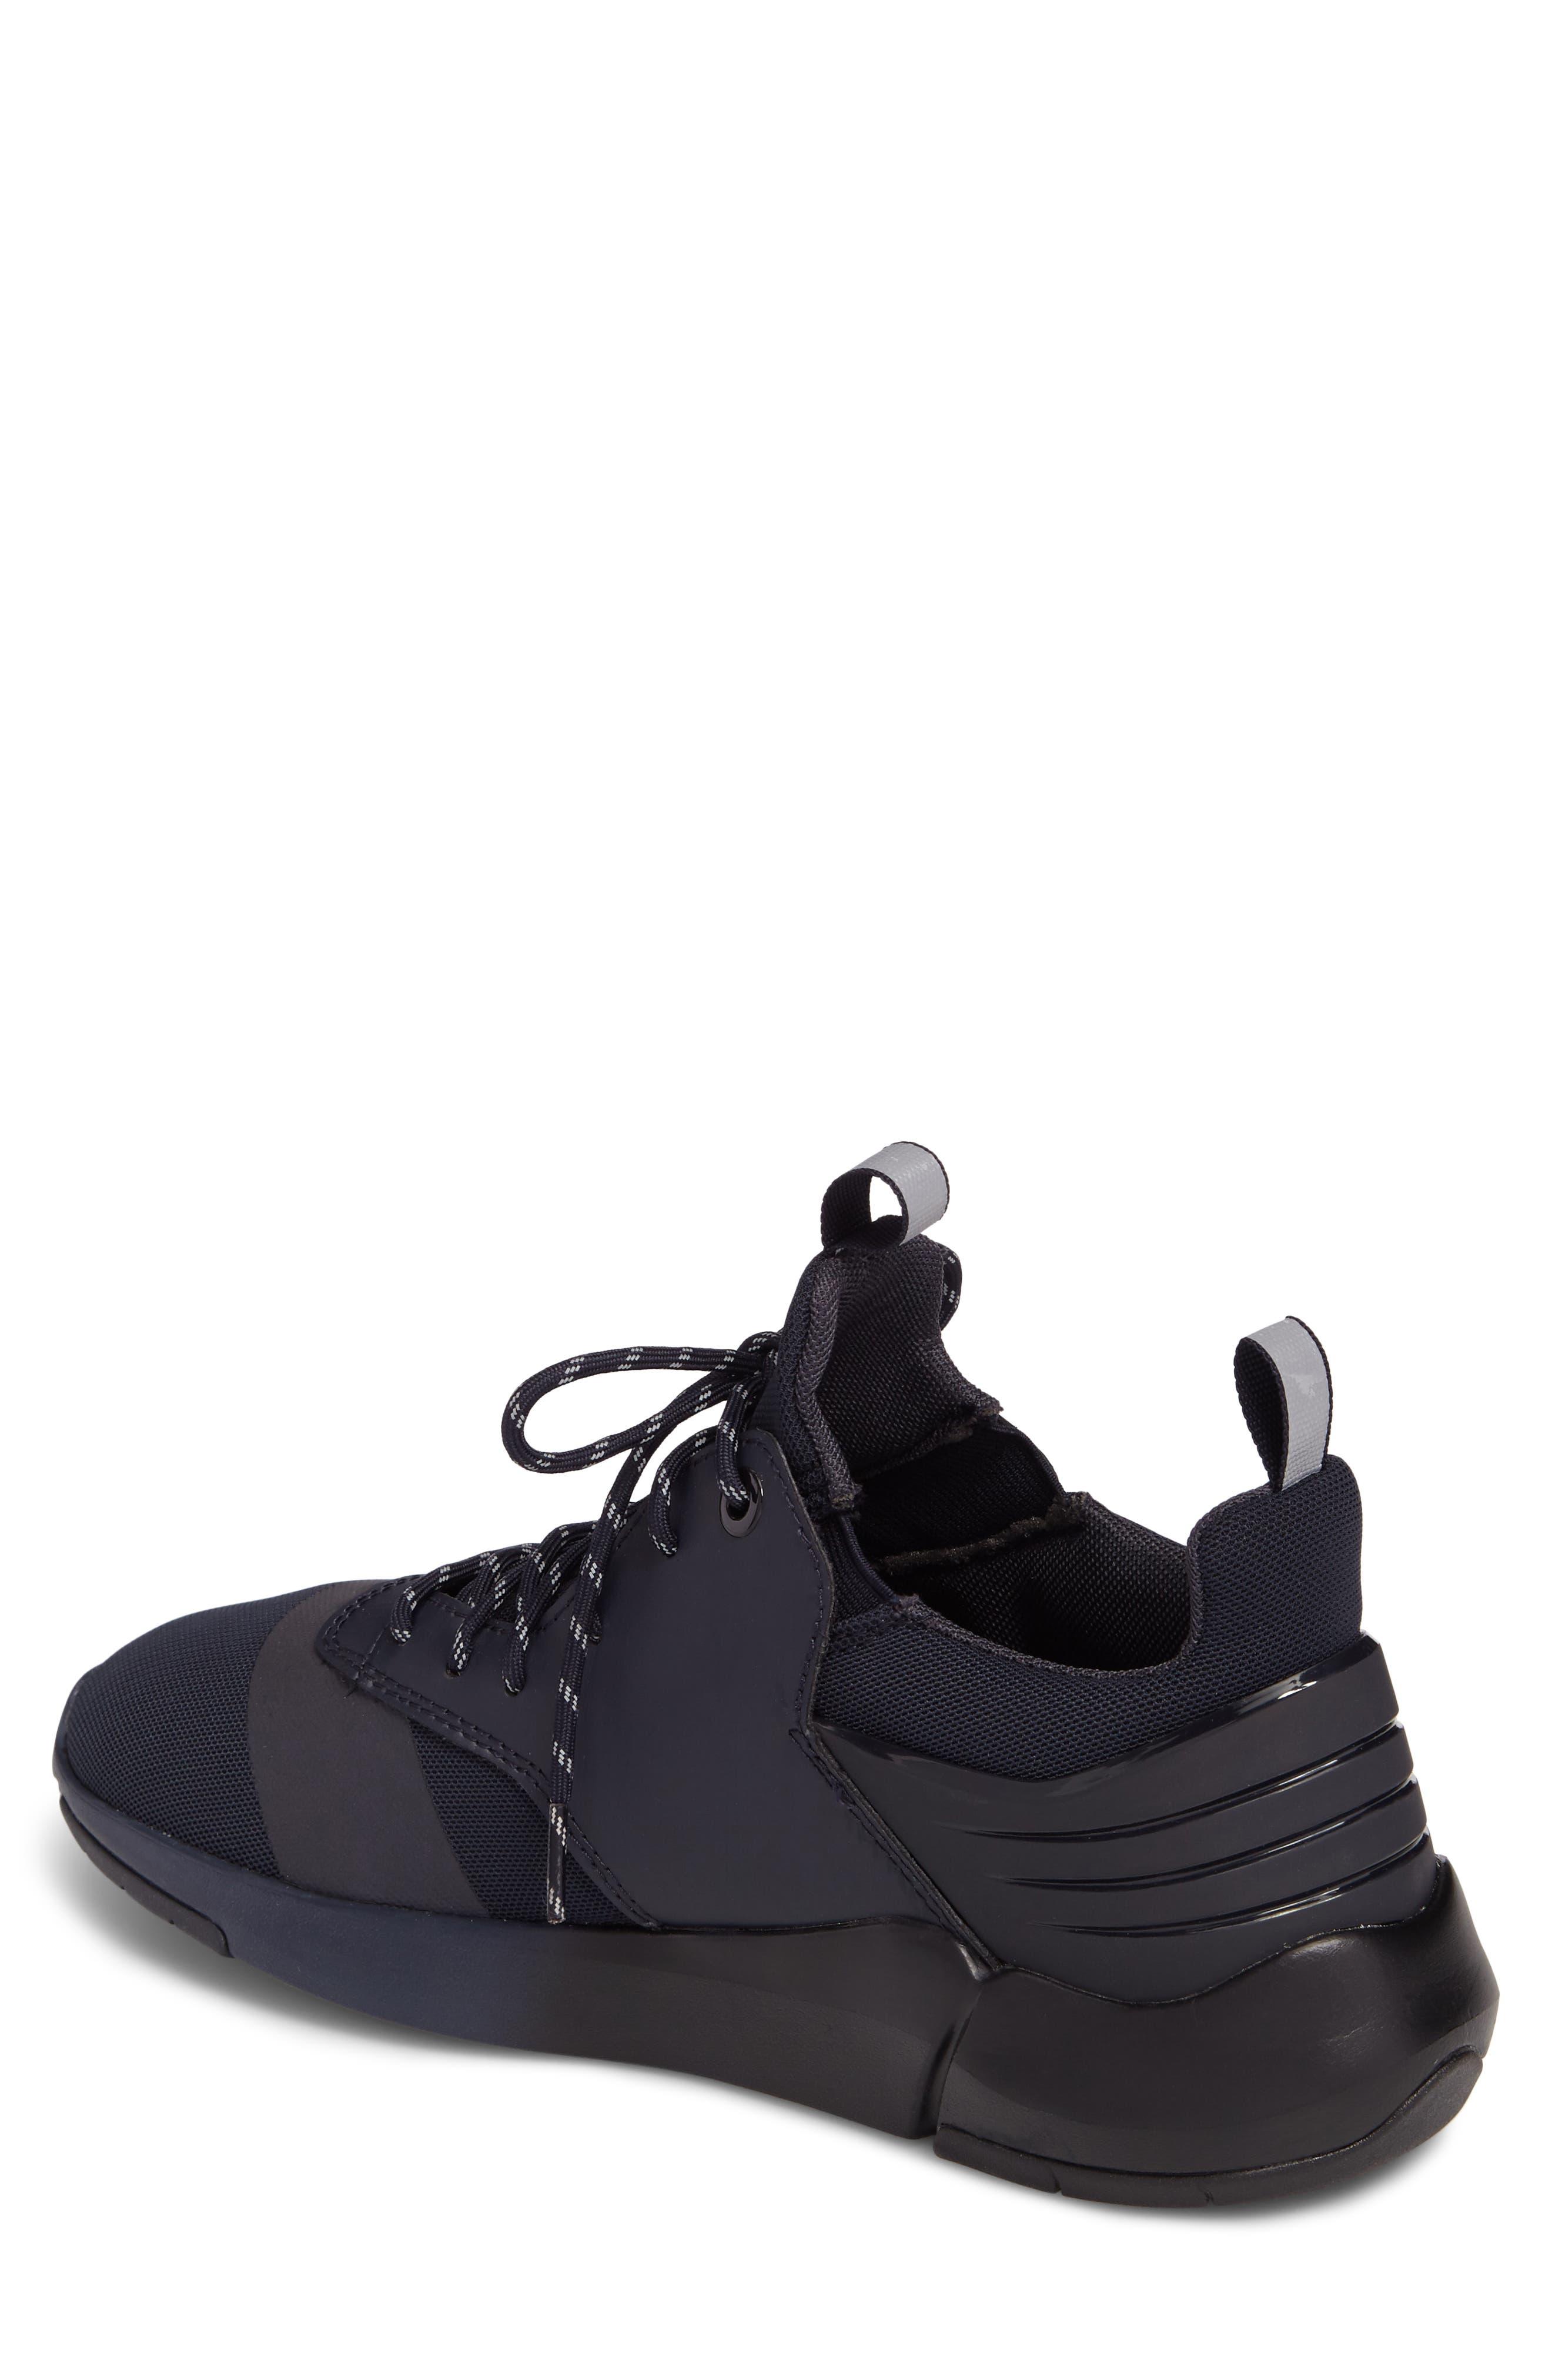 Motus Sneaker,                             Alternate thumbnail 2, color,                             Navy Reflective Leather